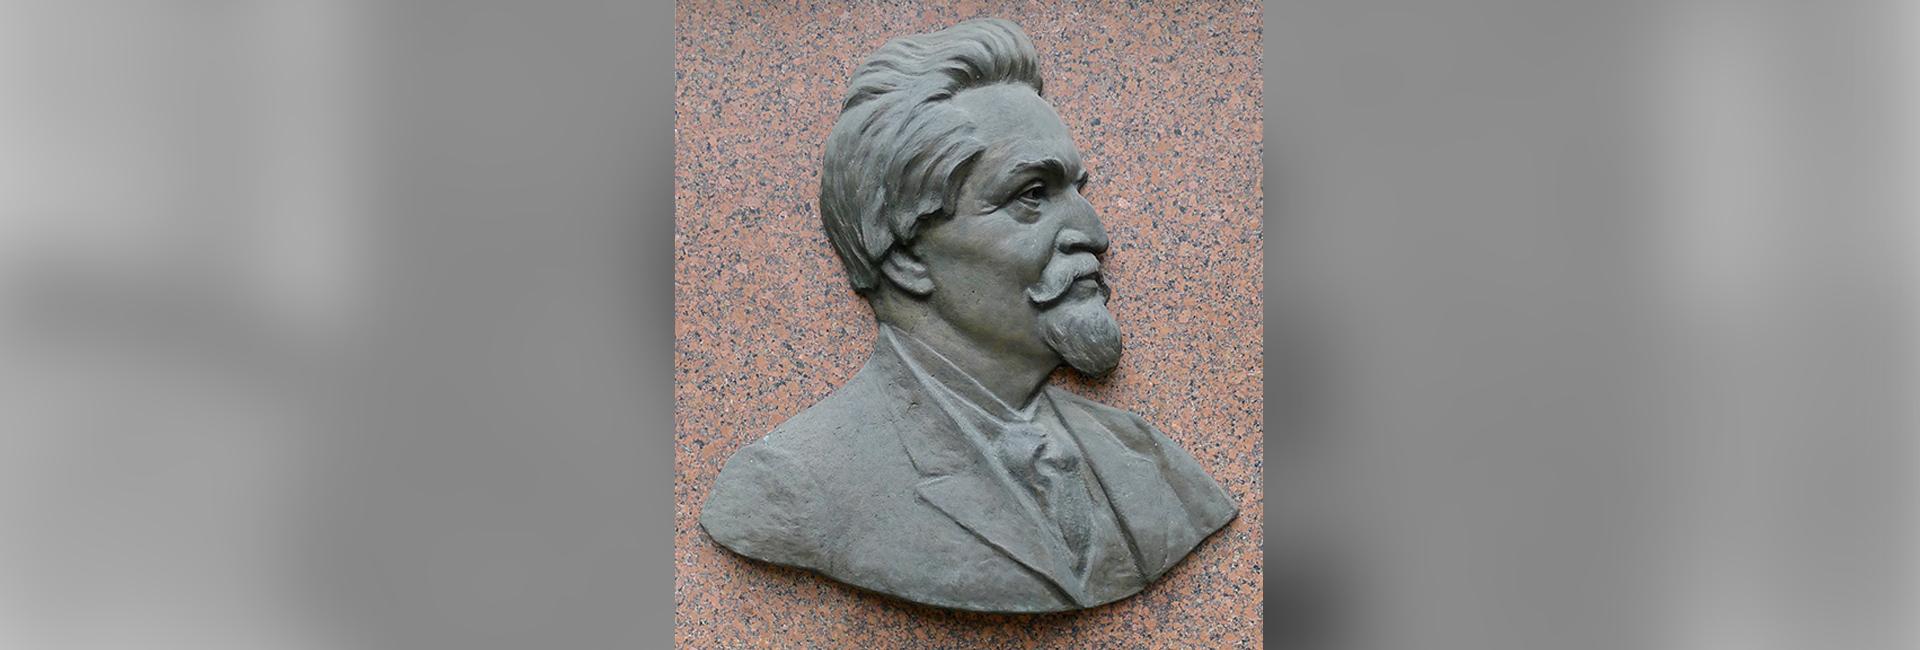 Alexandru Bernardazzi -arhitector și om de artă din Basarabia slider